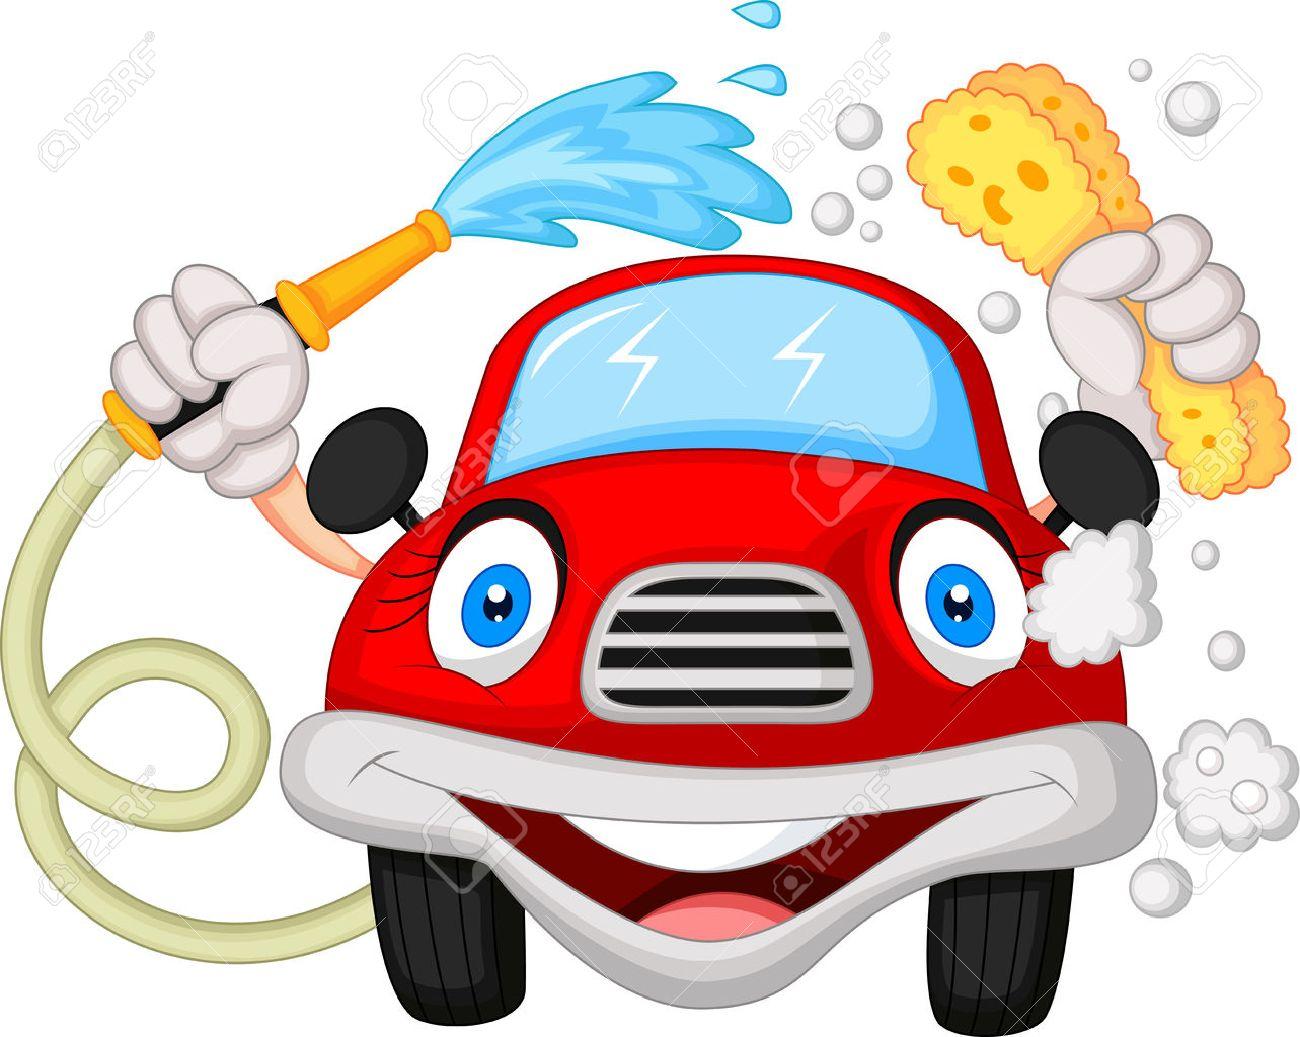 Washing Car Images & Stock Pictures. Royalty Free Washing Car ...